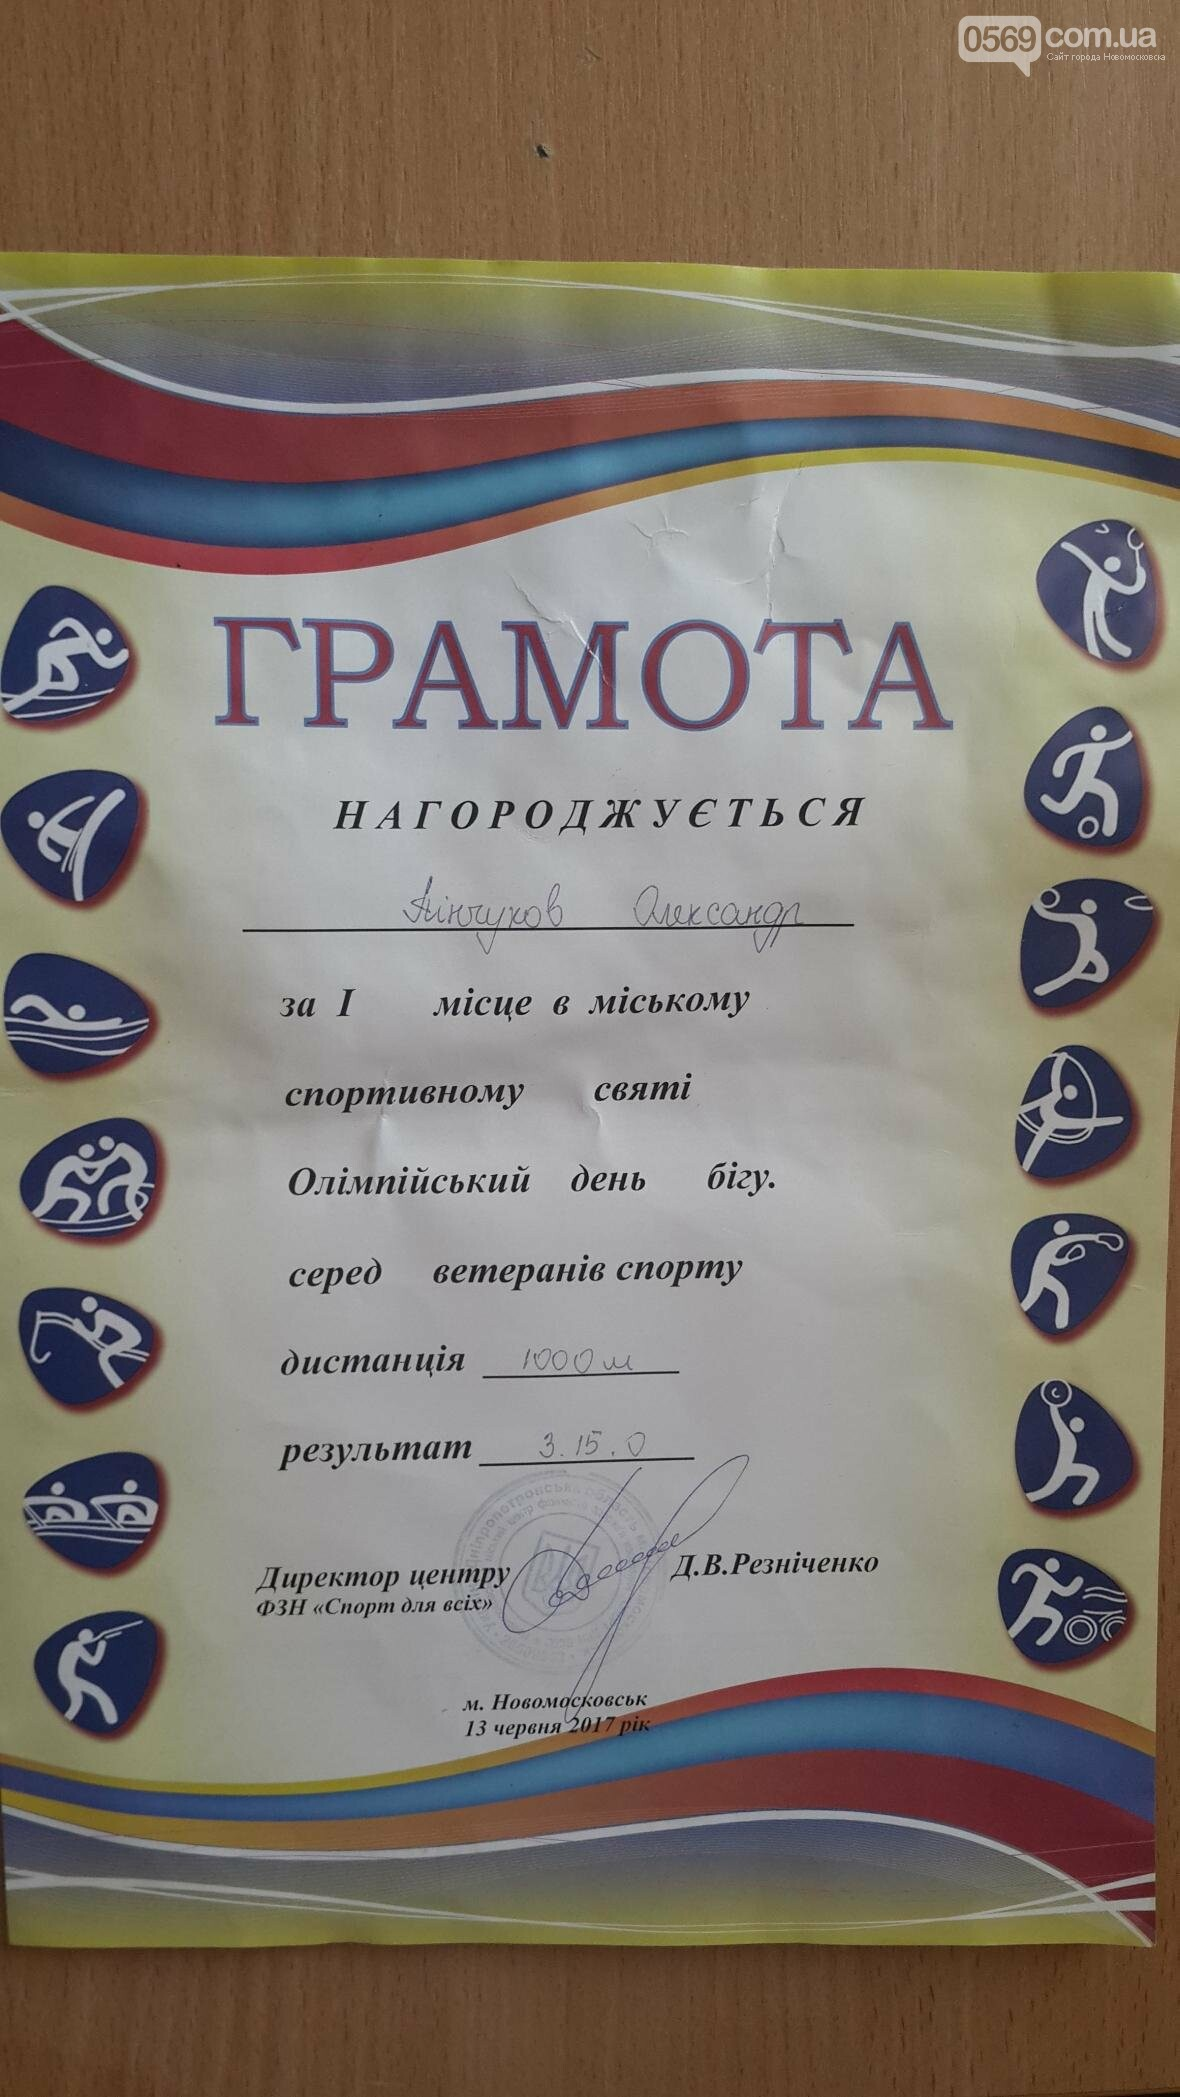 Новомосковец, пробежавший 42 километра. Кто он?, фото-2